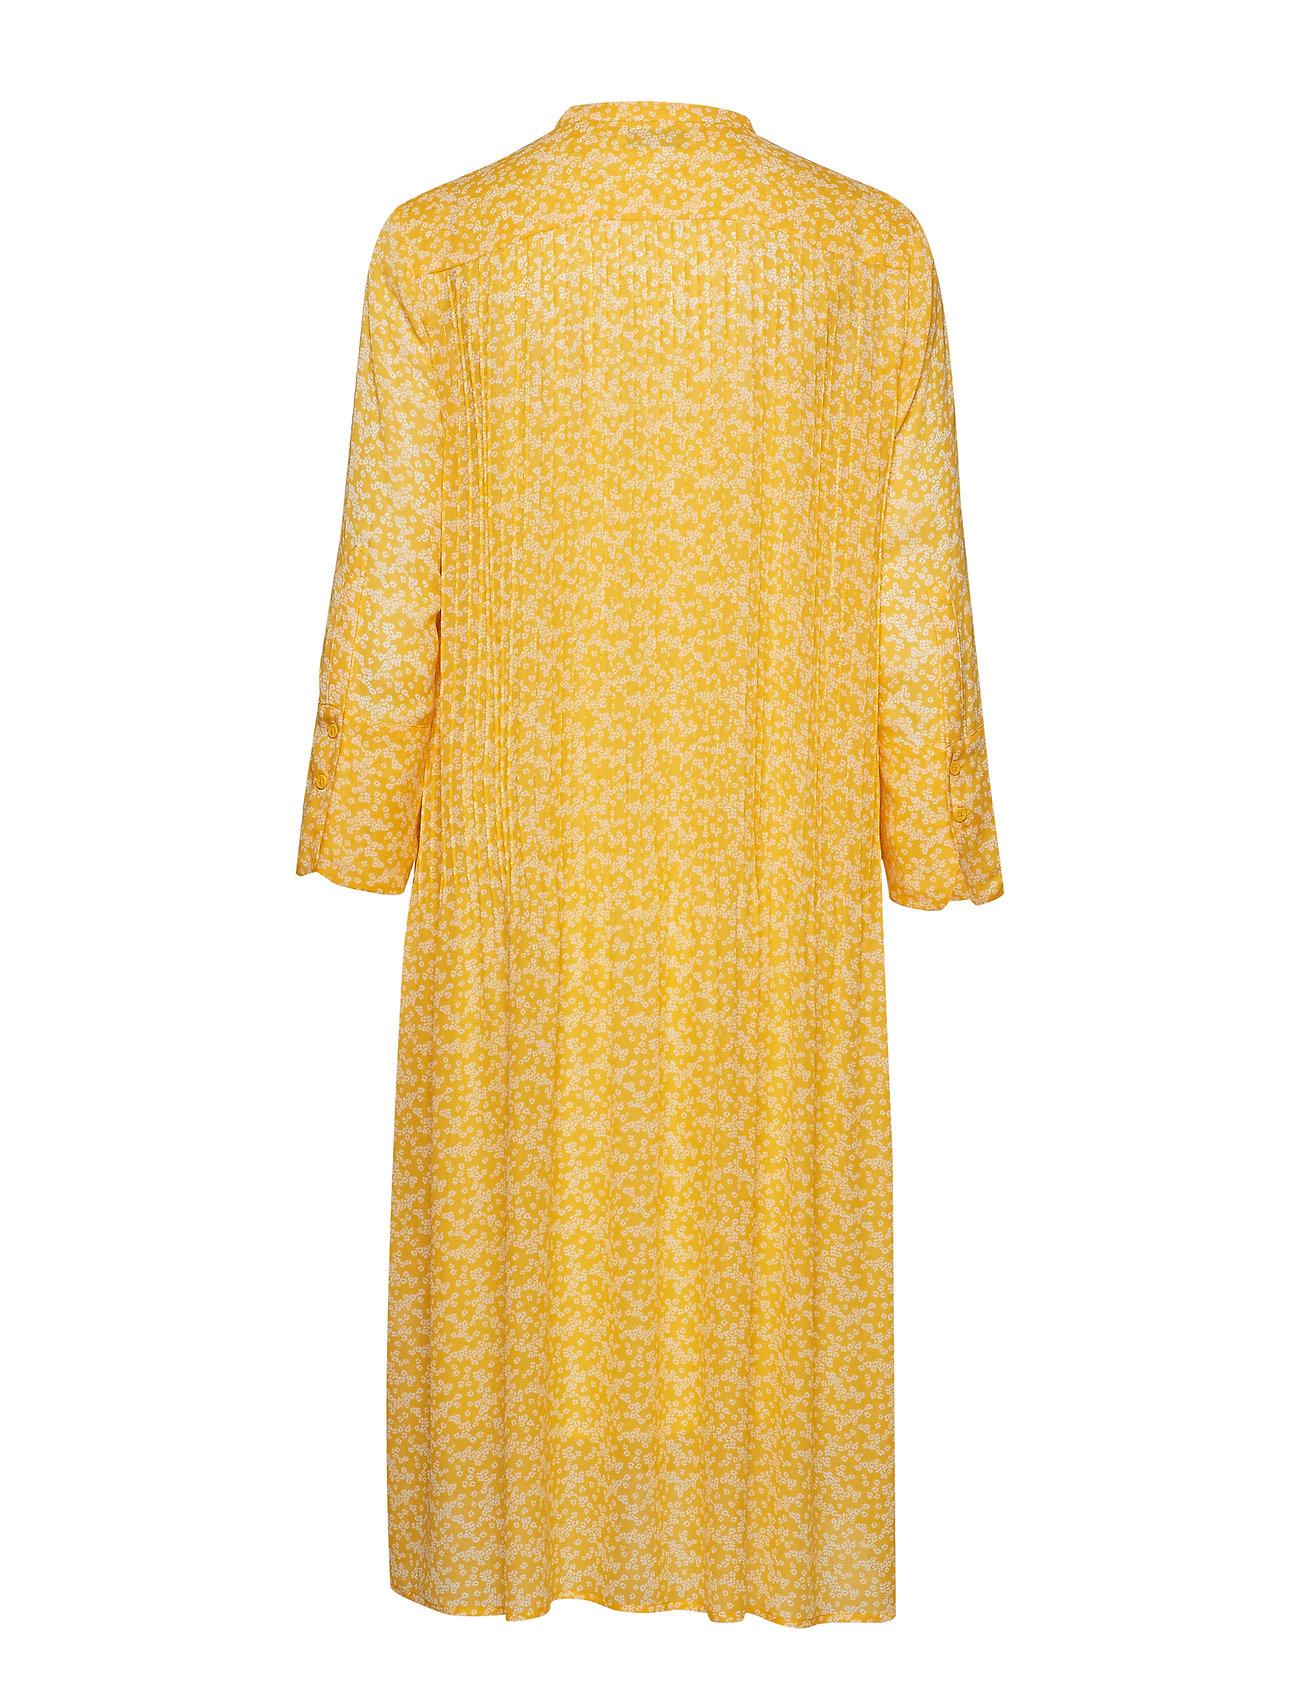 Shirt Dress Shirt Dress Aop 9695aranciaSamsøeamp; Aop 9695aranciaSamsøeamp; Elm Elm Elm 34LjR5qA